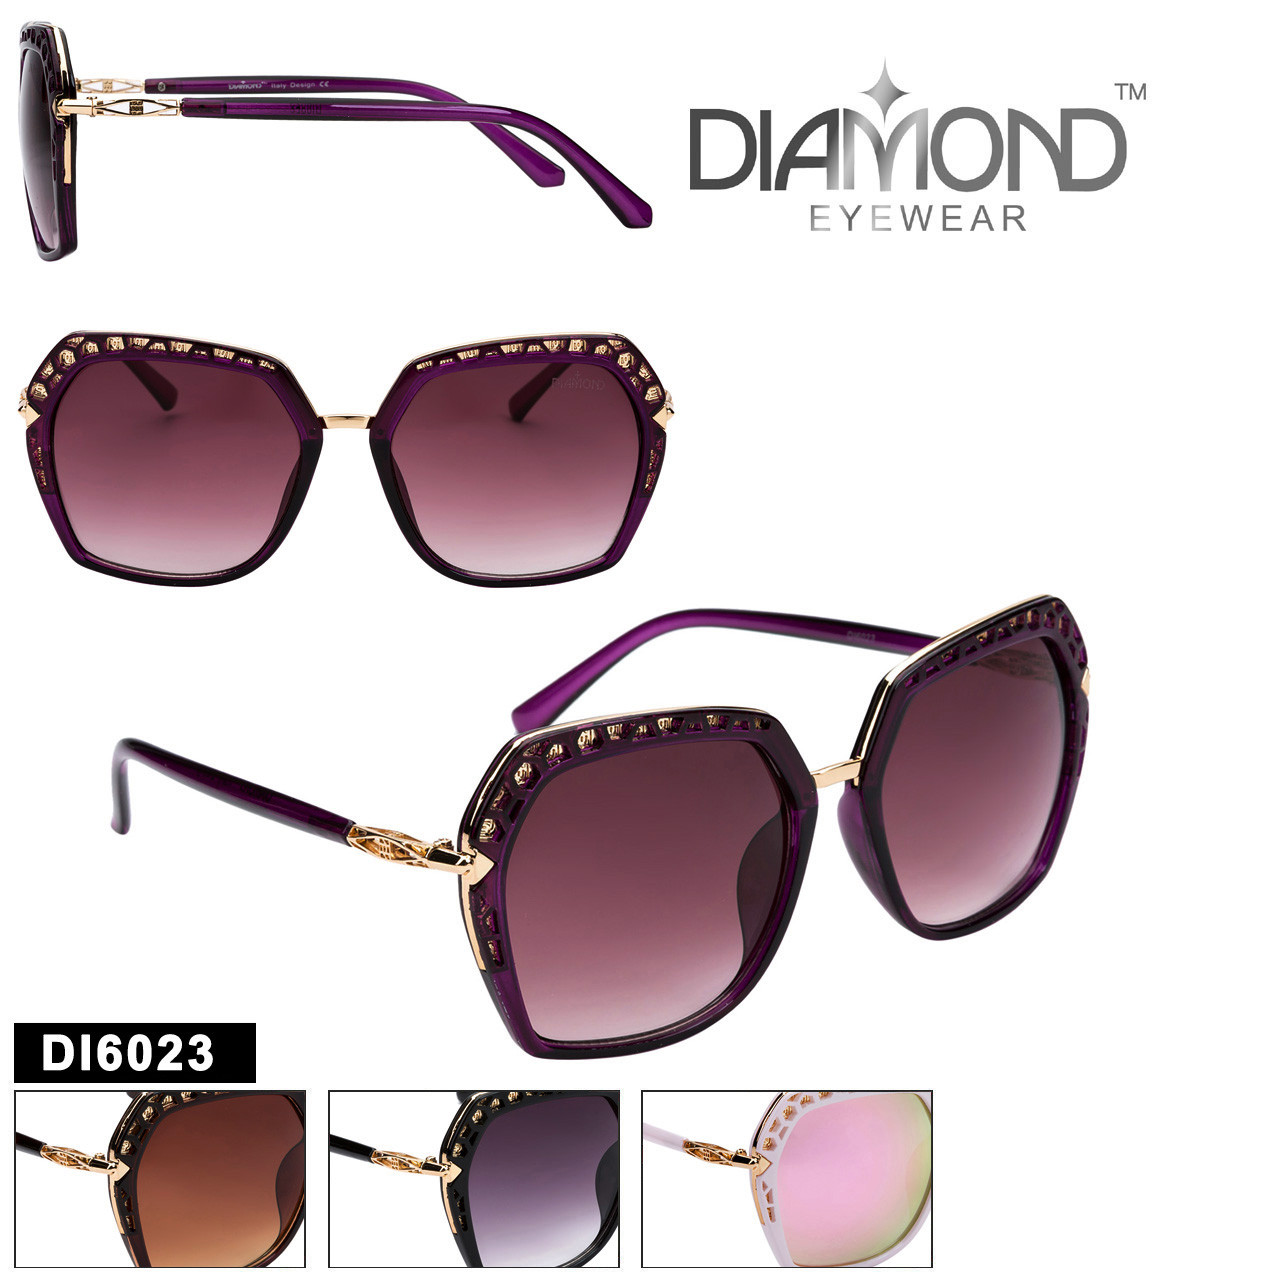 Diamond™ Eyewear Fashion Sunglasses - DI6023